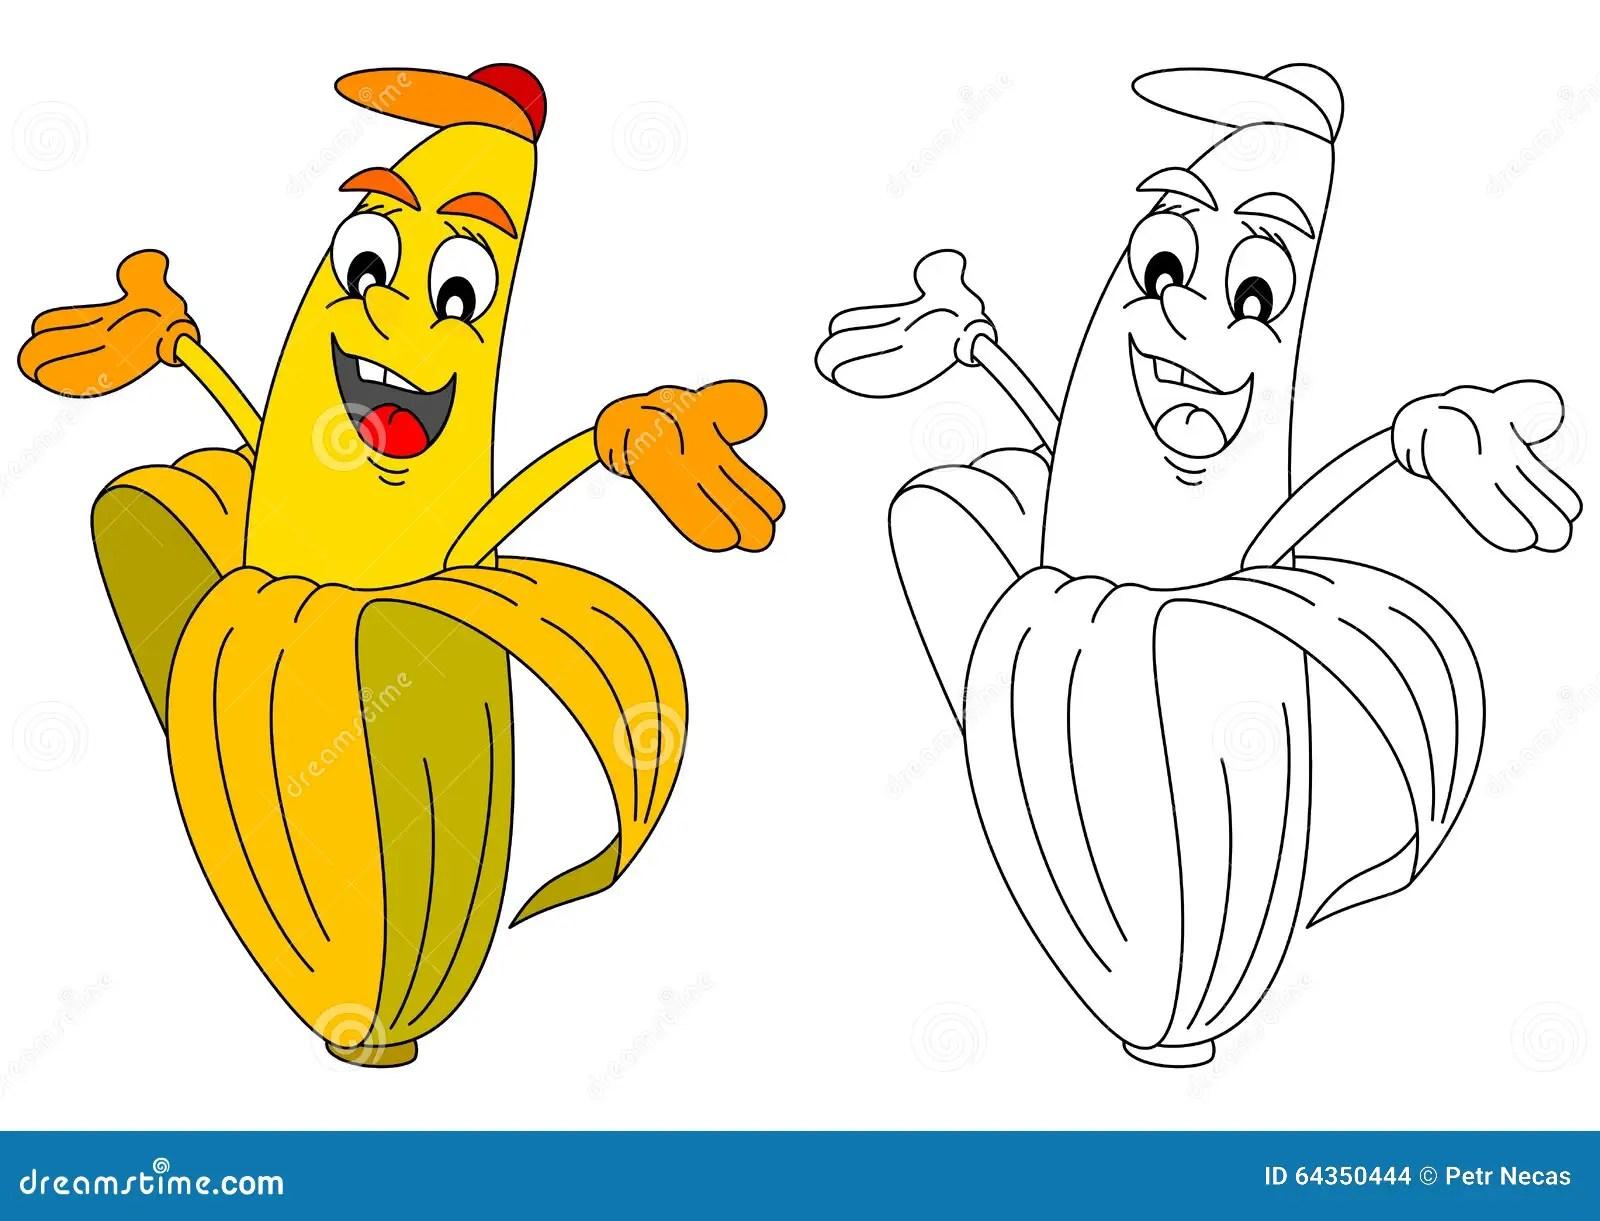 Yellow Banana And Children Drawing Stock Image